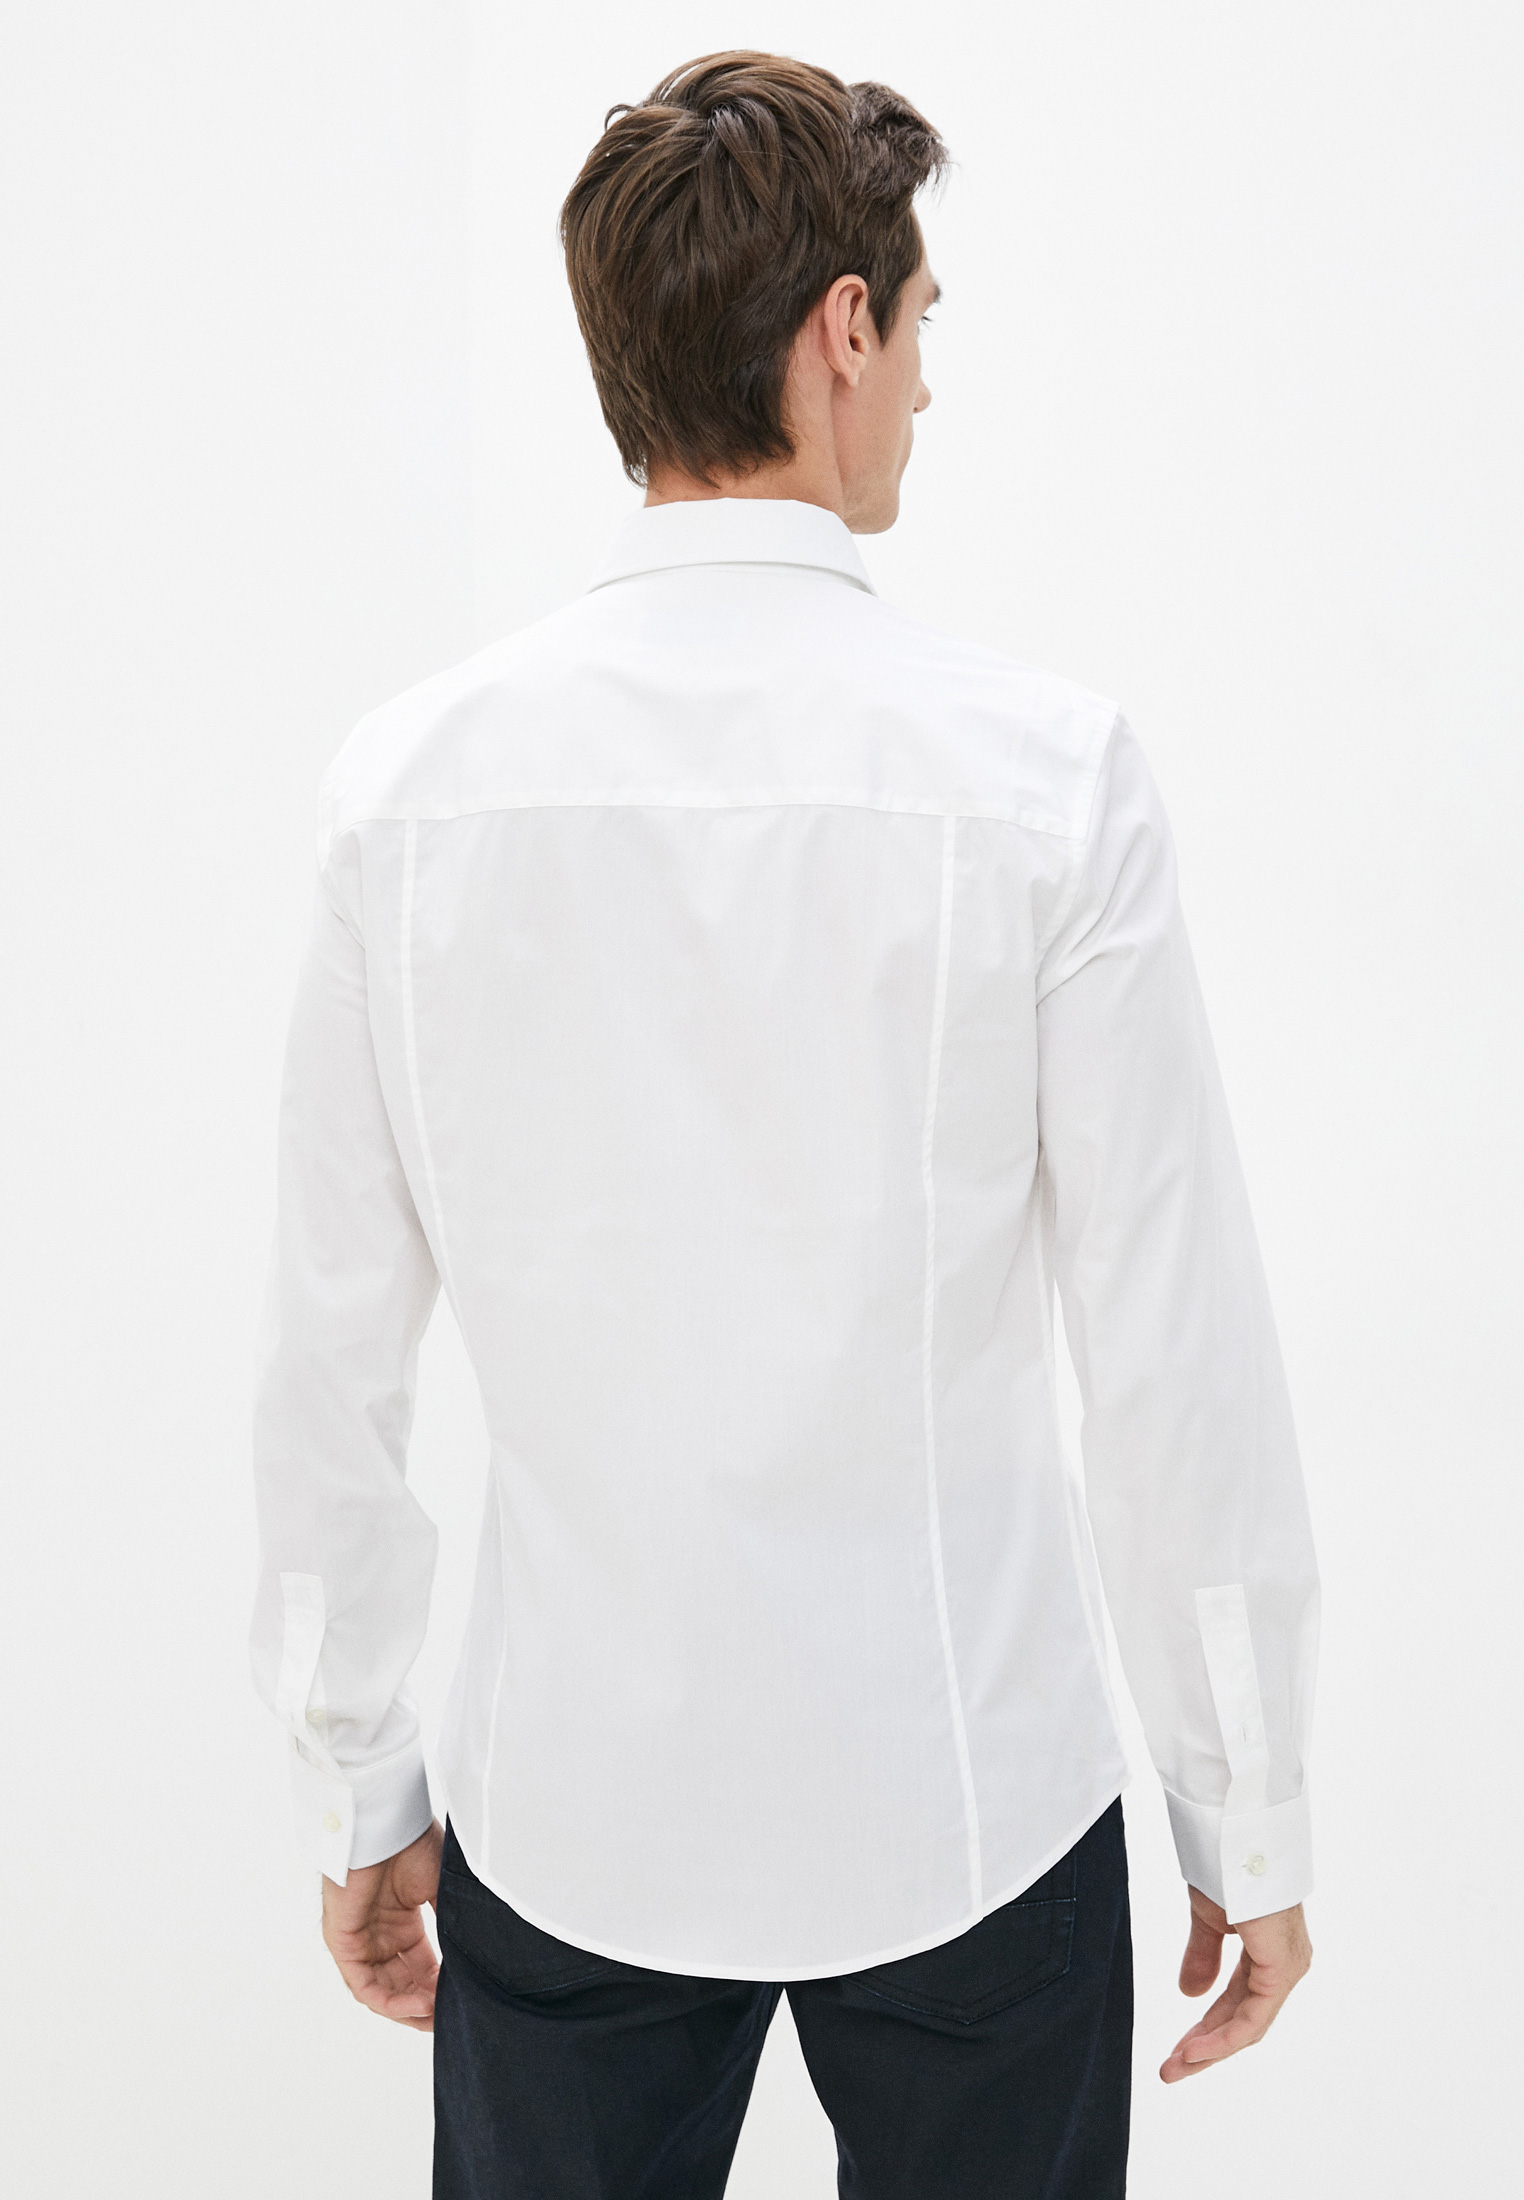 Рубашка с длинным рукавом Bikkembergs (Биккембергс) C C 009 2C S 2931: изображение 10